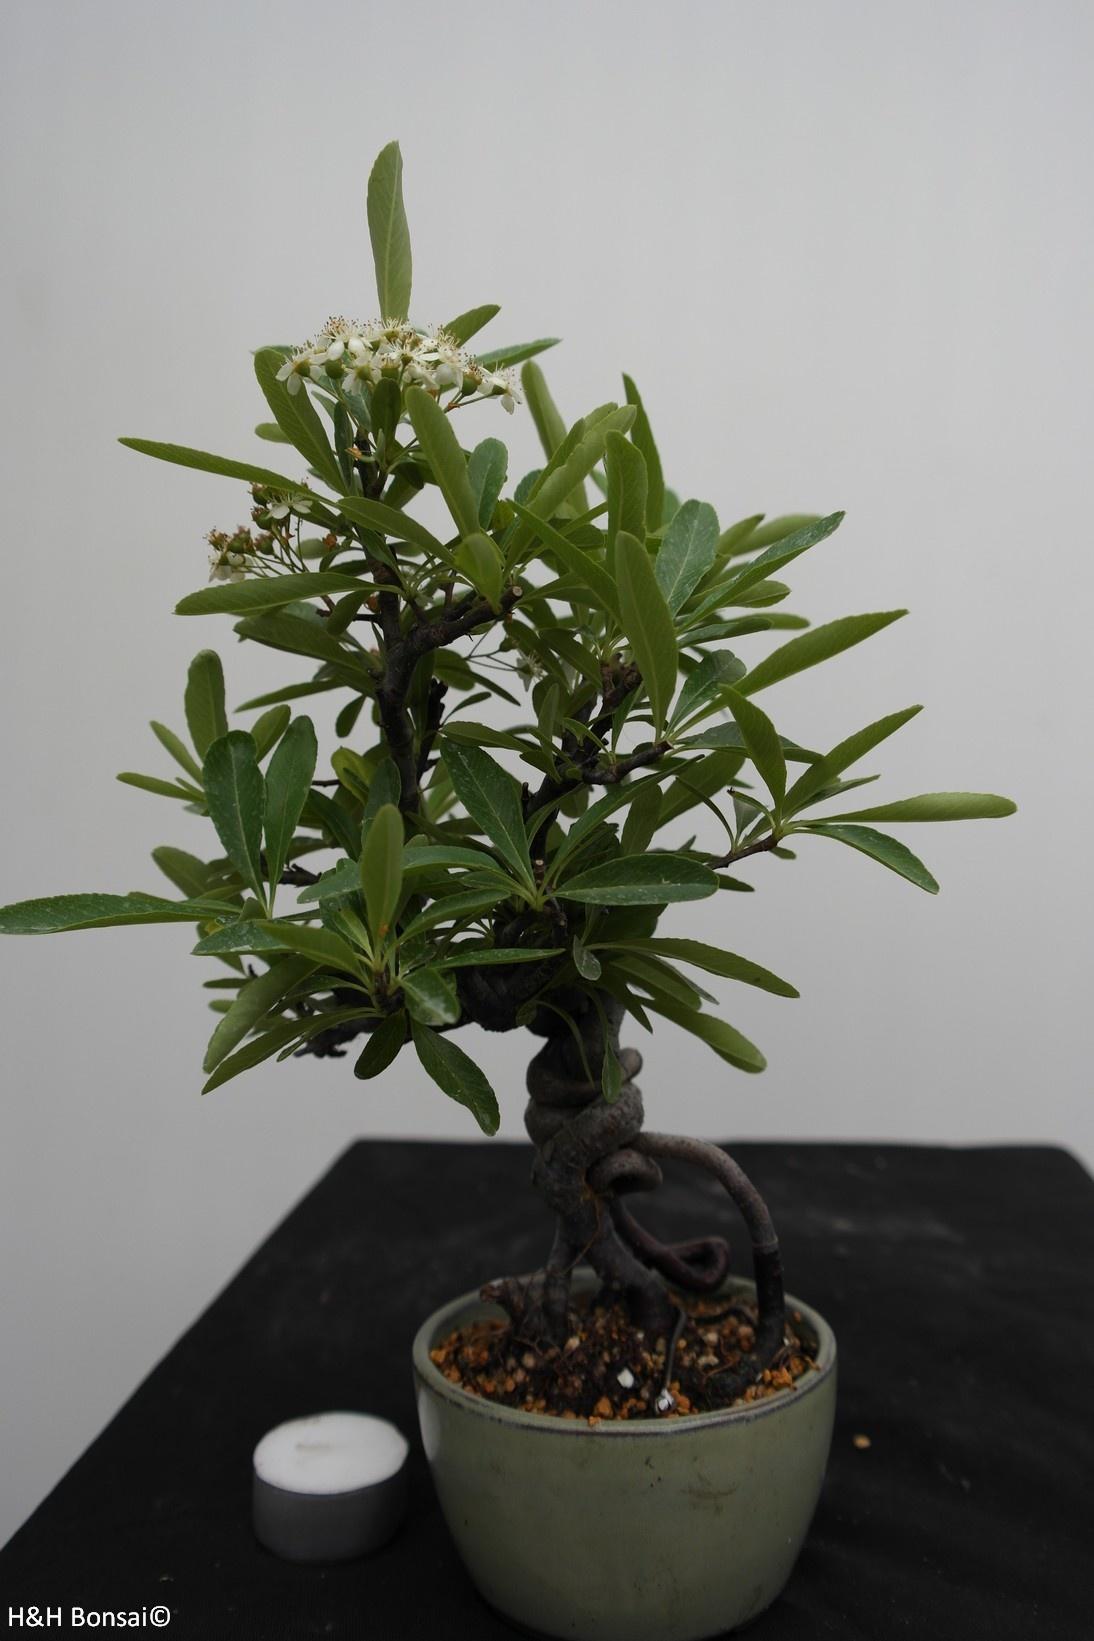 Bonsai Feuerdorn, Pyracantha, nr. 7525